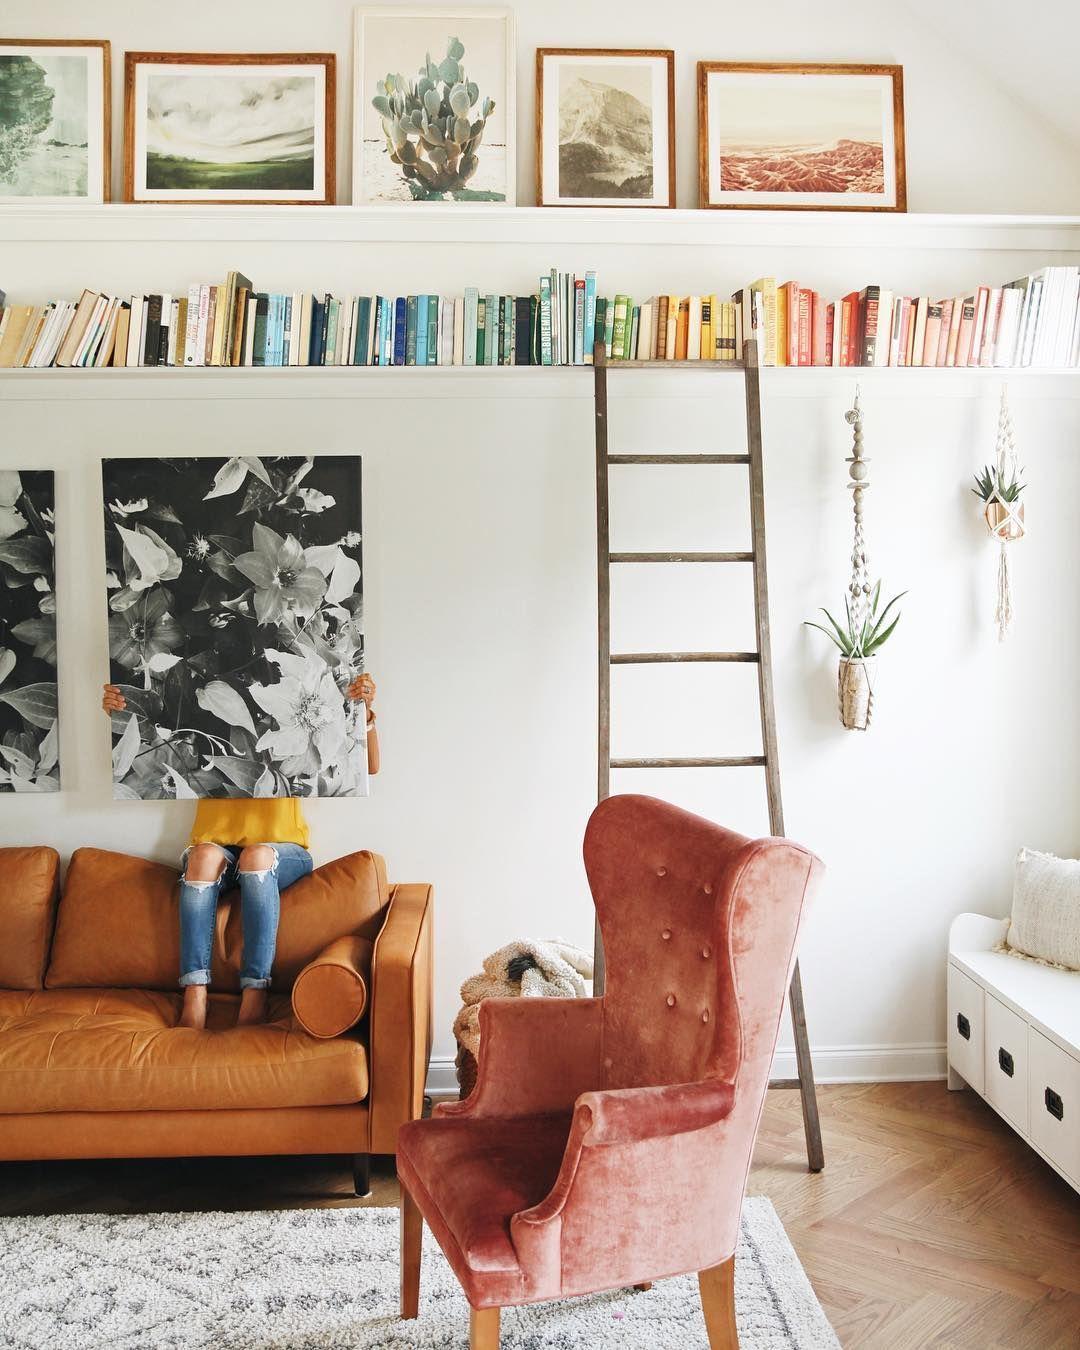 DIY wall art + DIY picture ledge / bookshelves